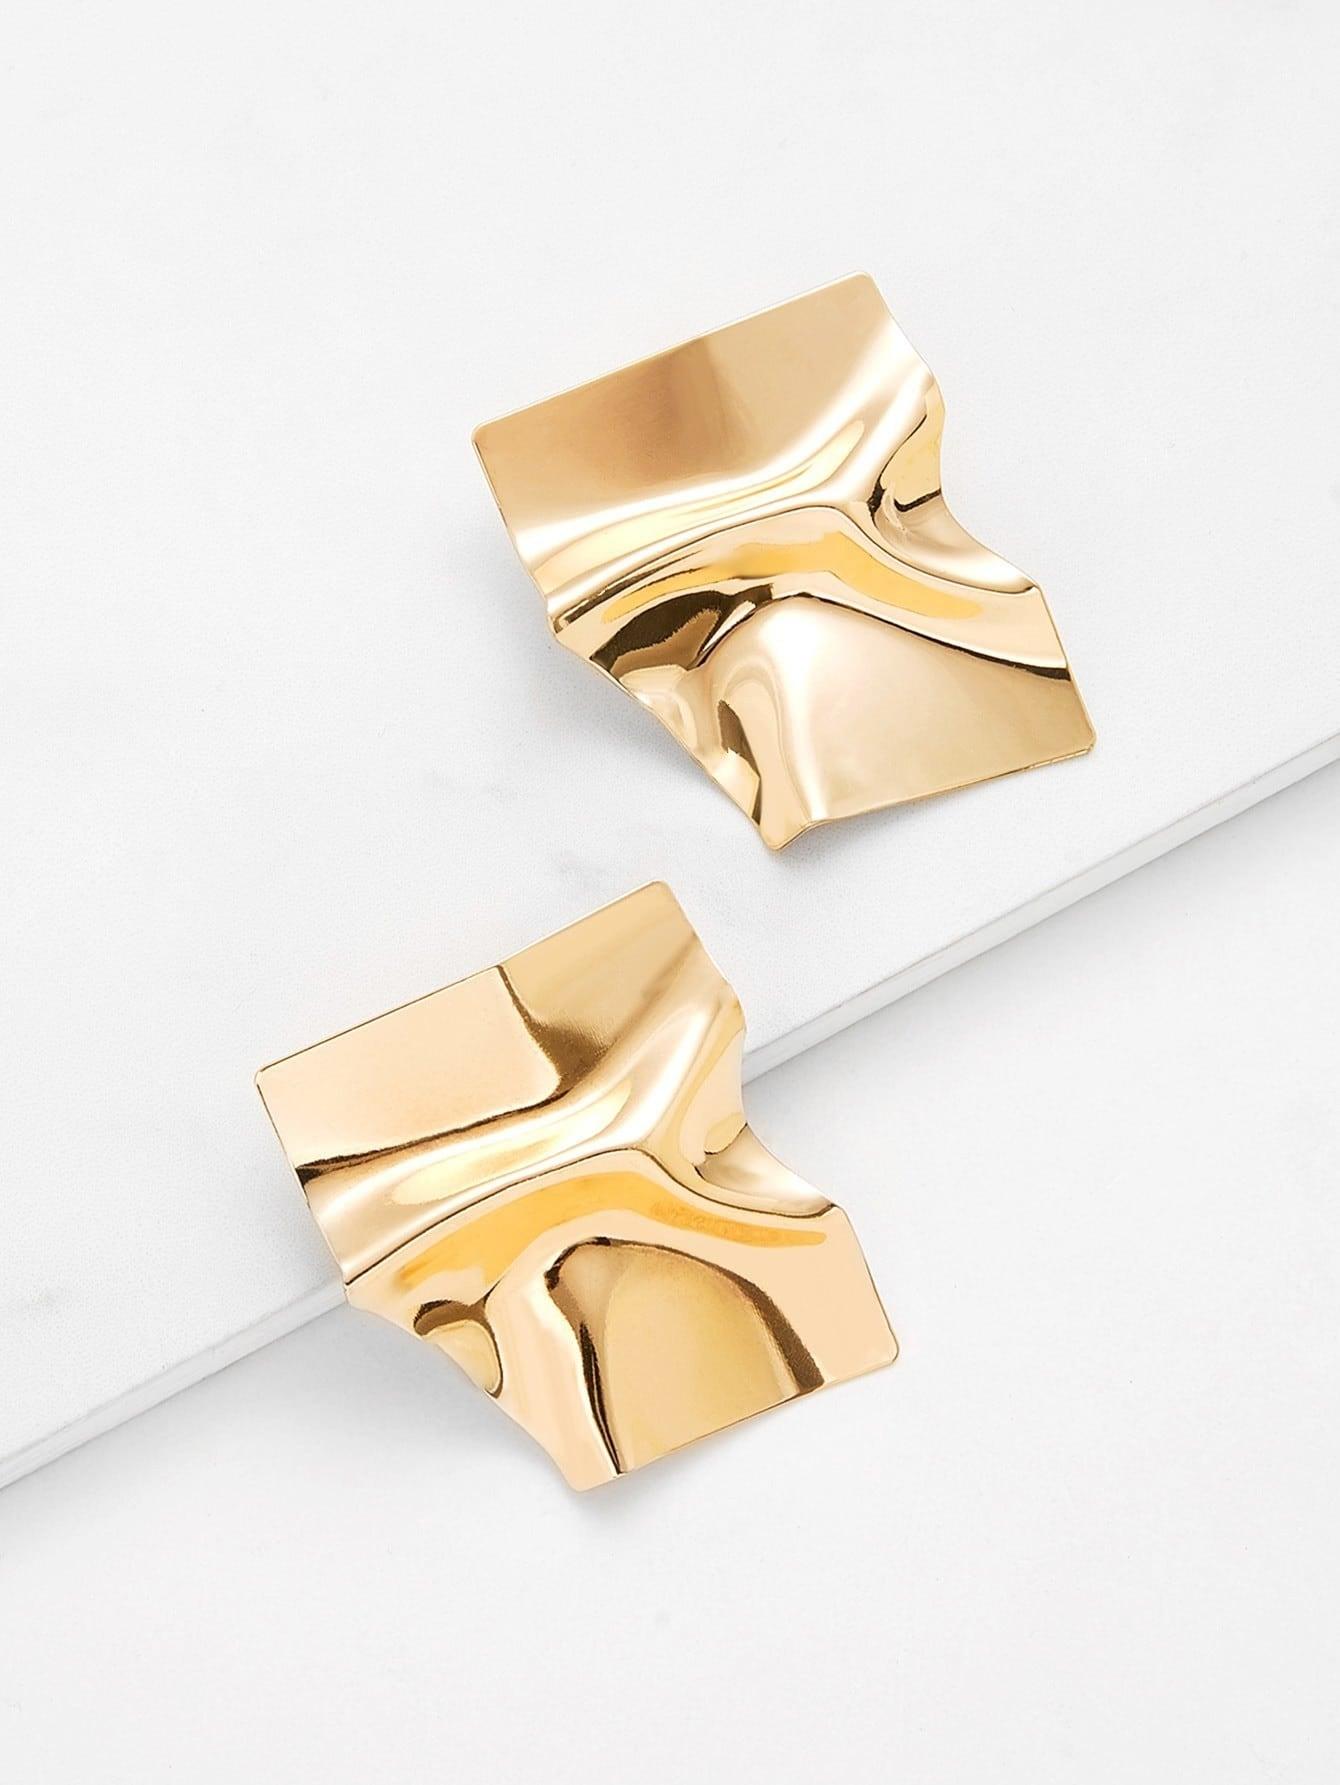 Irregular Shaped Stud Earrings waterdrop shaped stud earrings